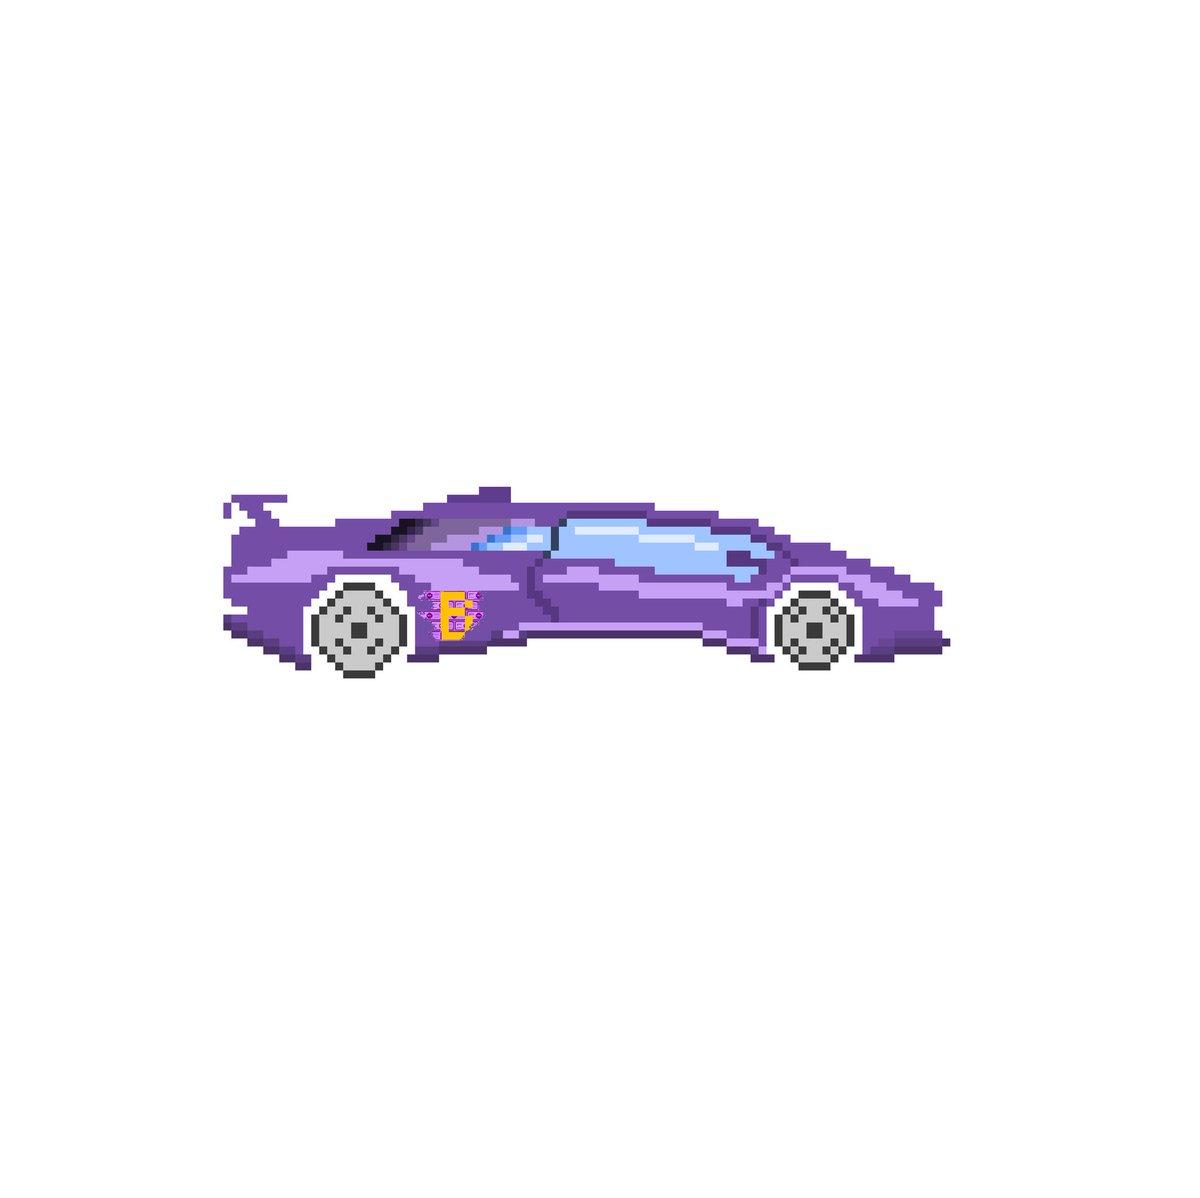 Superbrick On Twitter Purple Lambo Pixelart Pixel Art